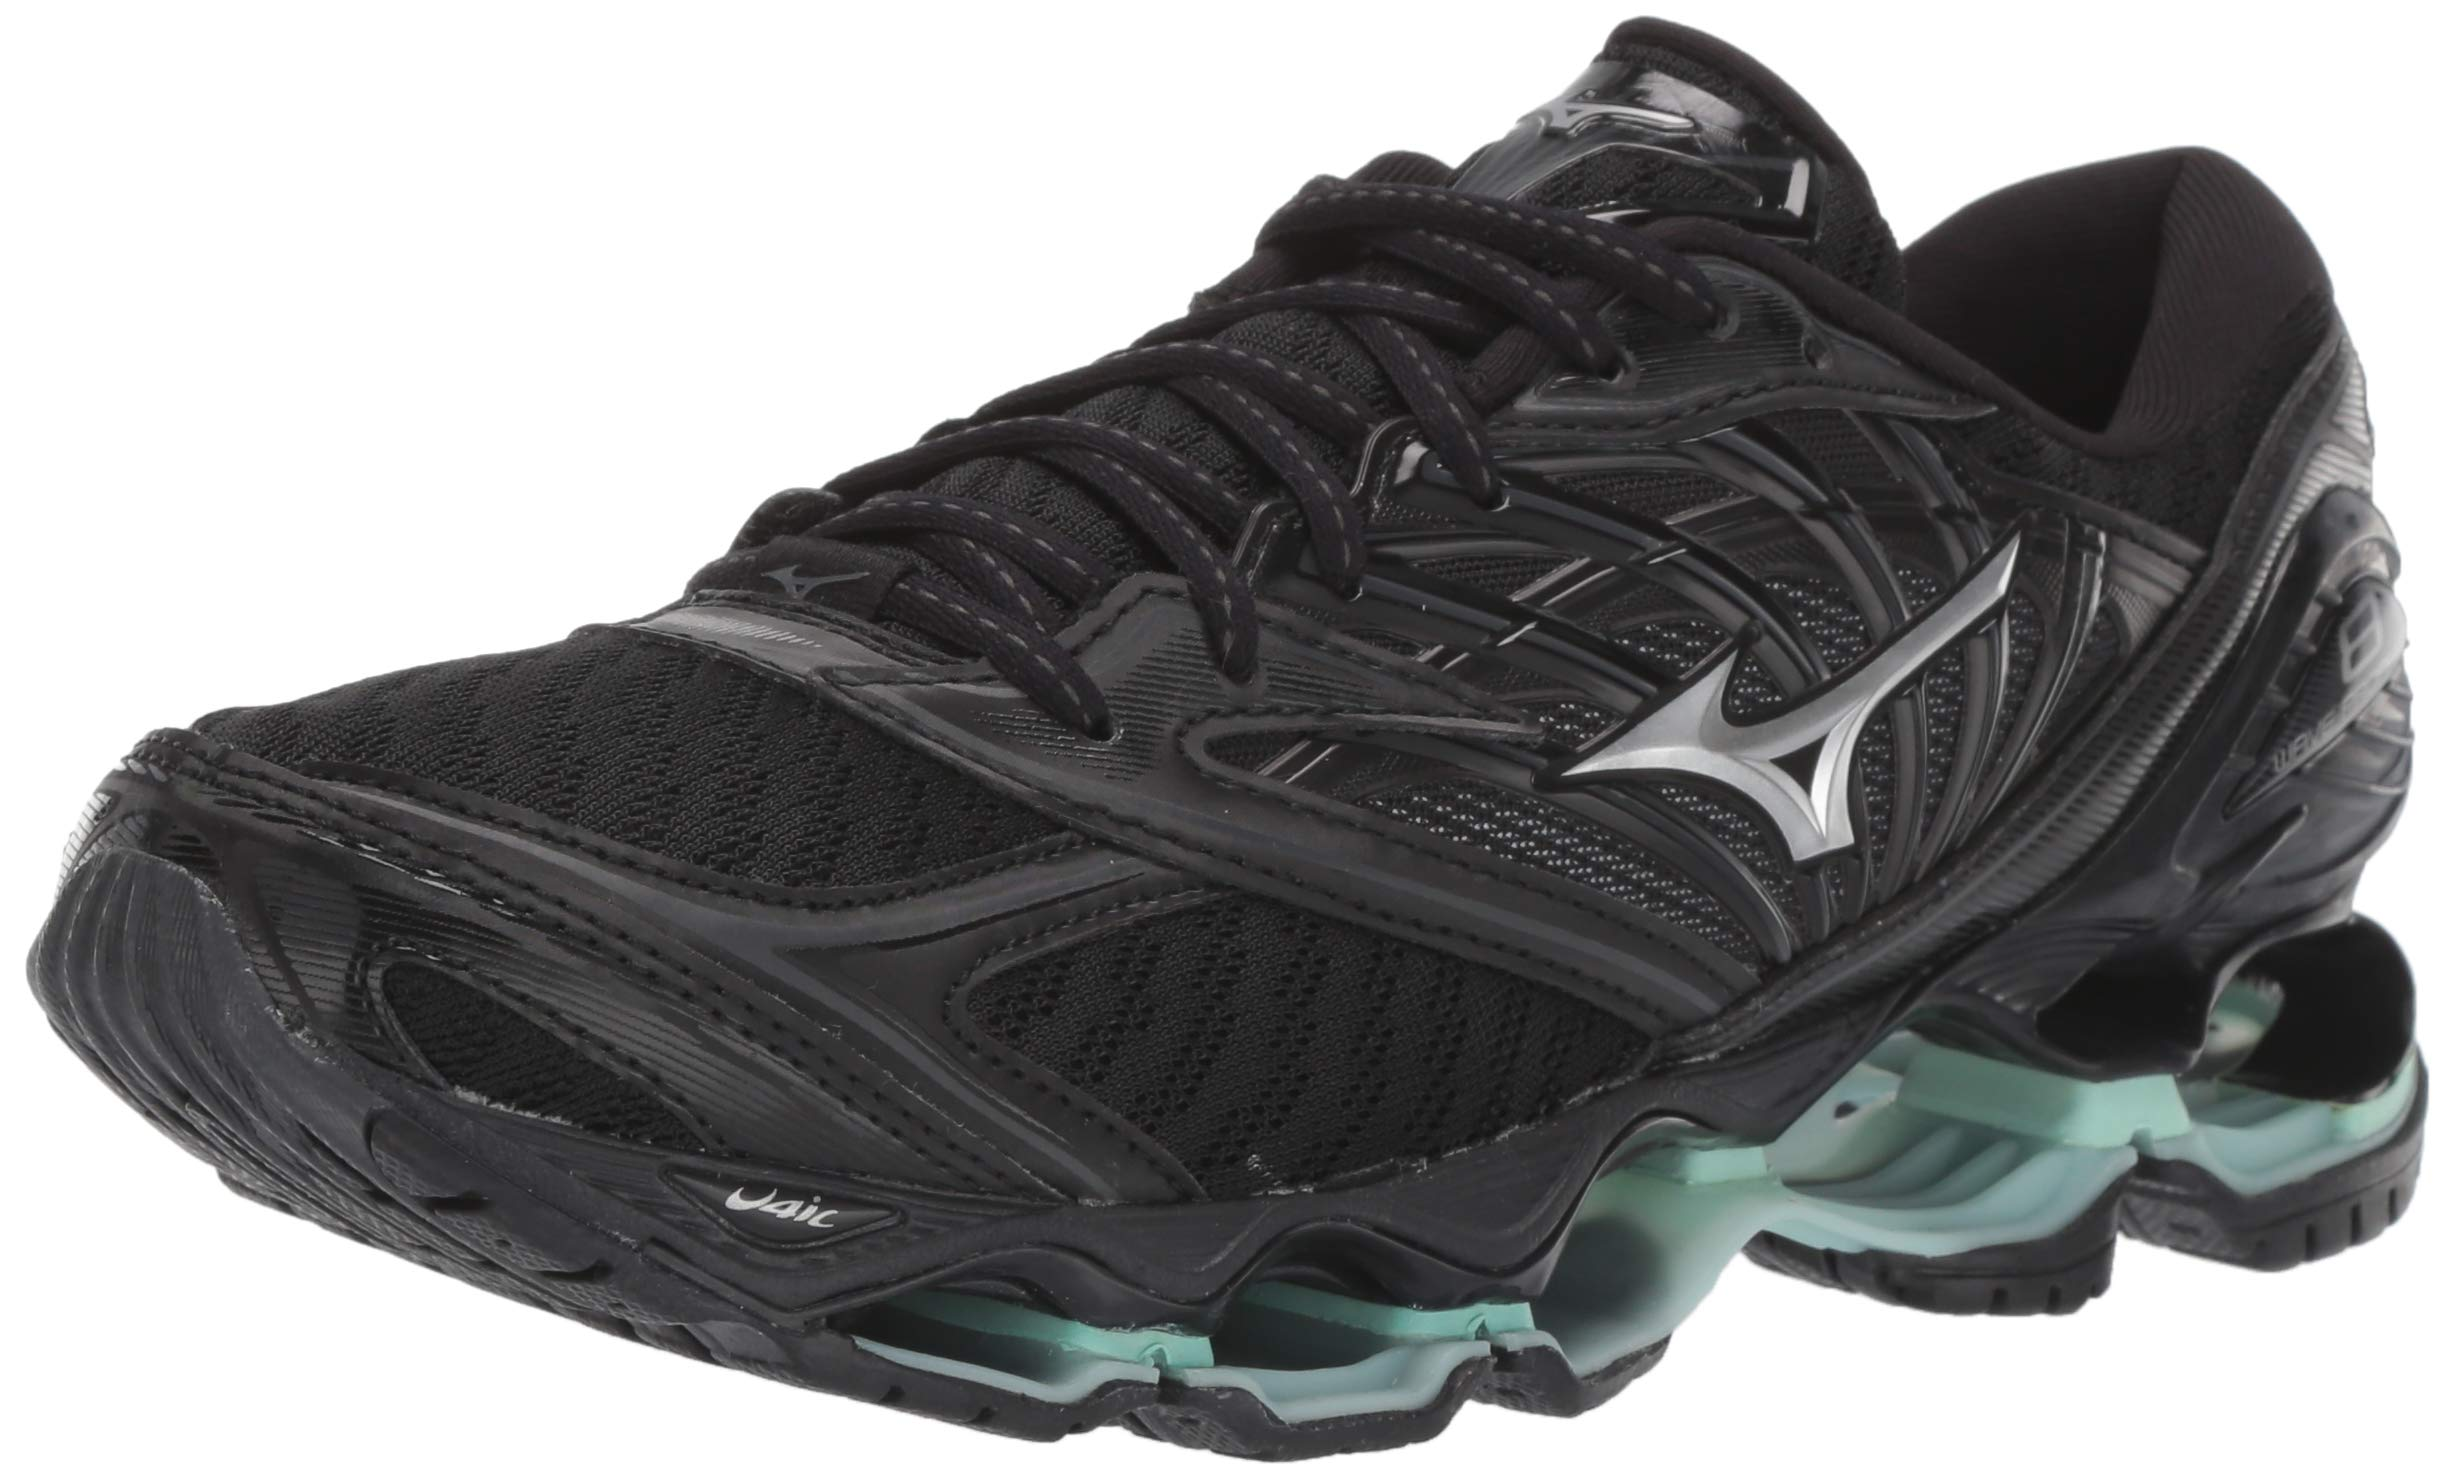 Mizuno Women's Wave Prophecy 8 Running Shoe, Black/Silver, 6.5 B US